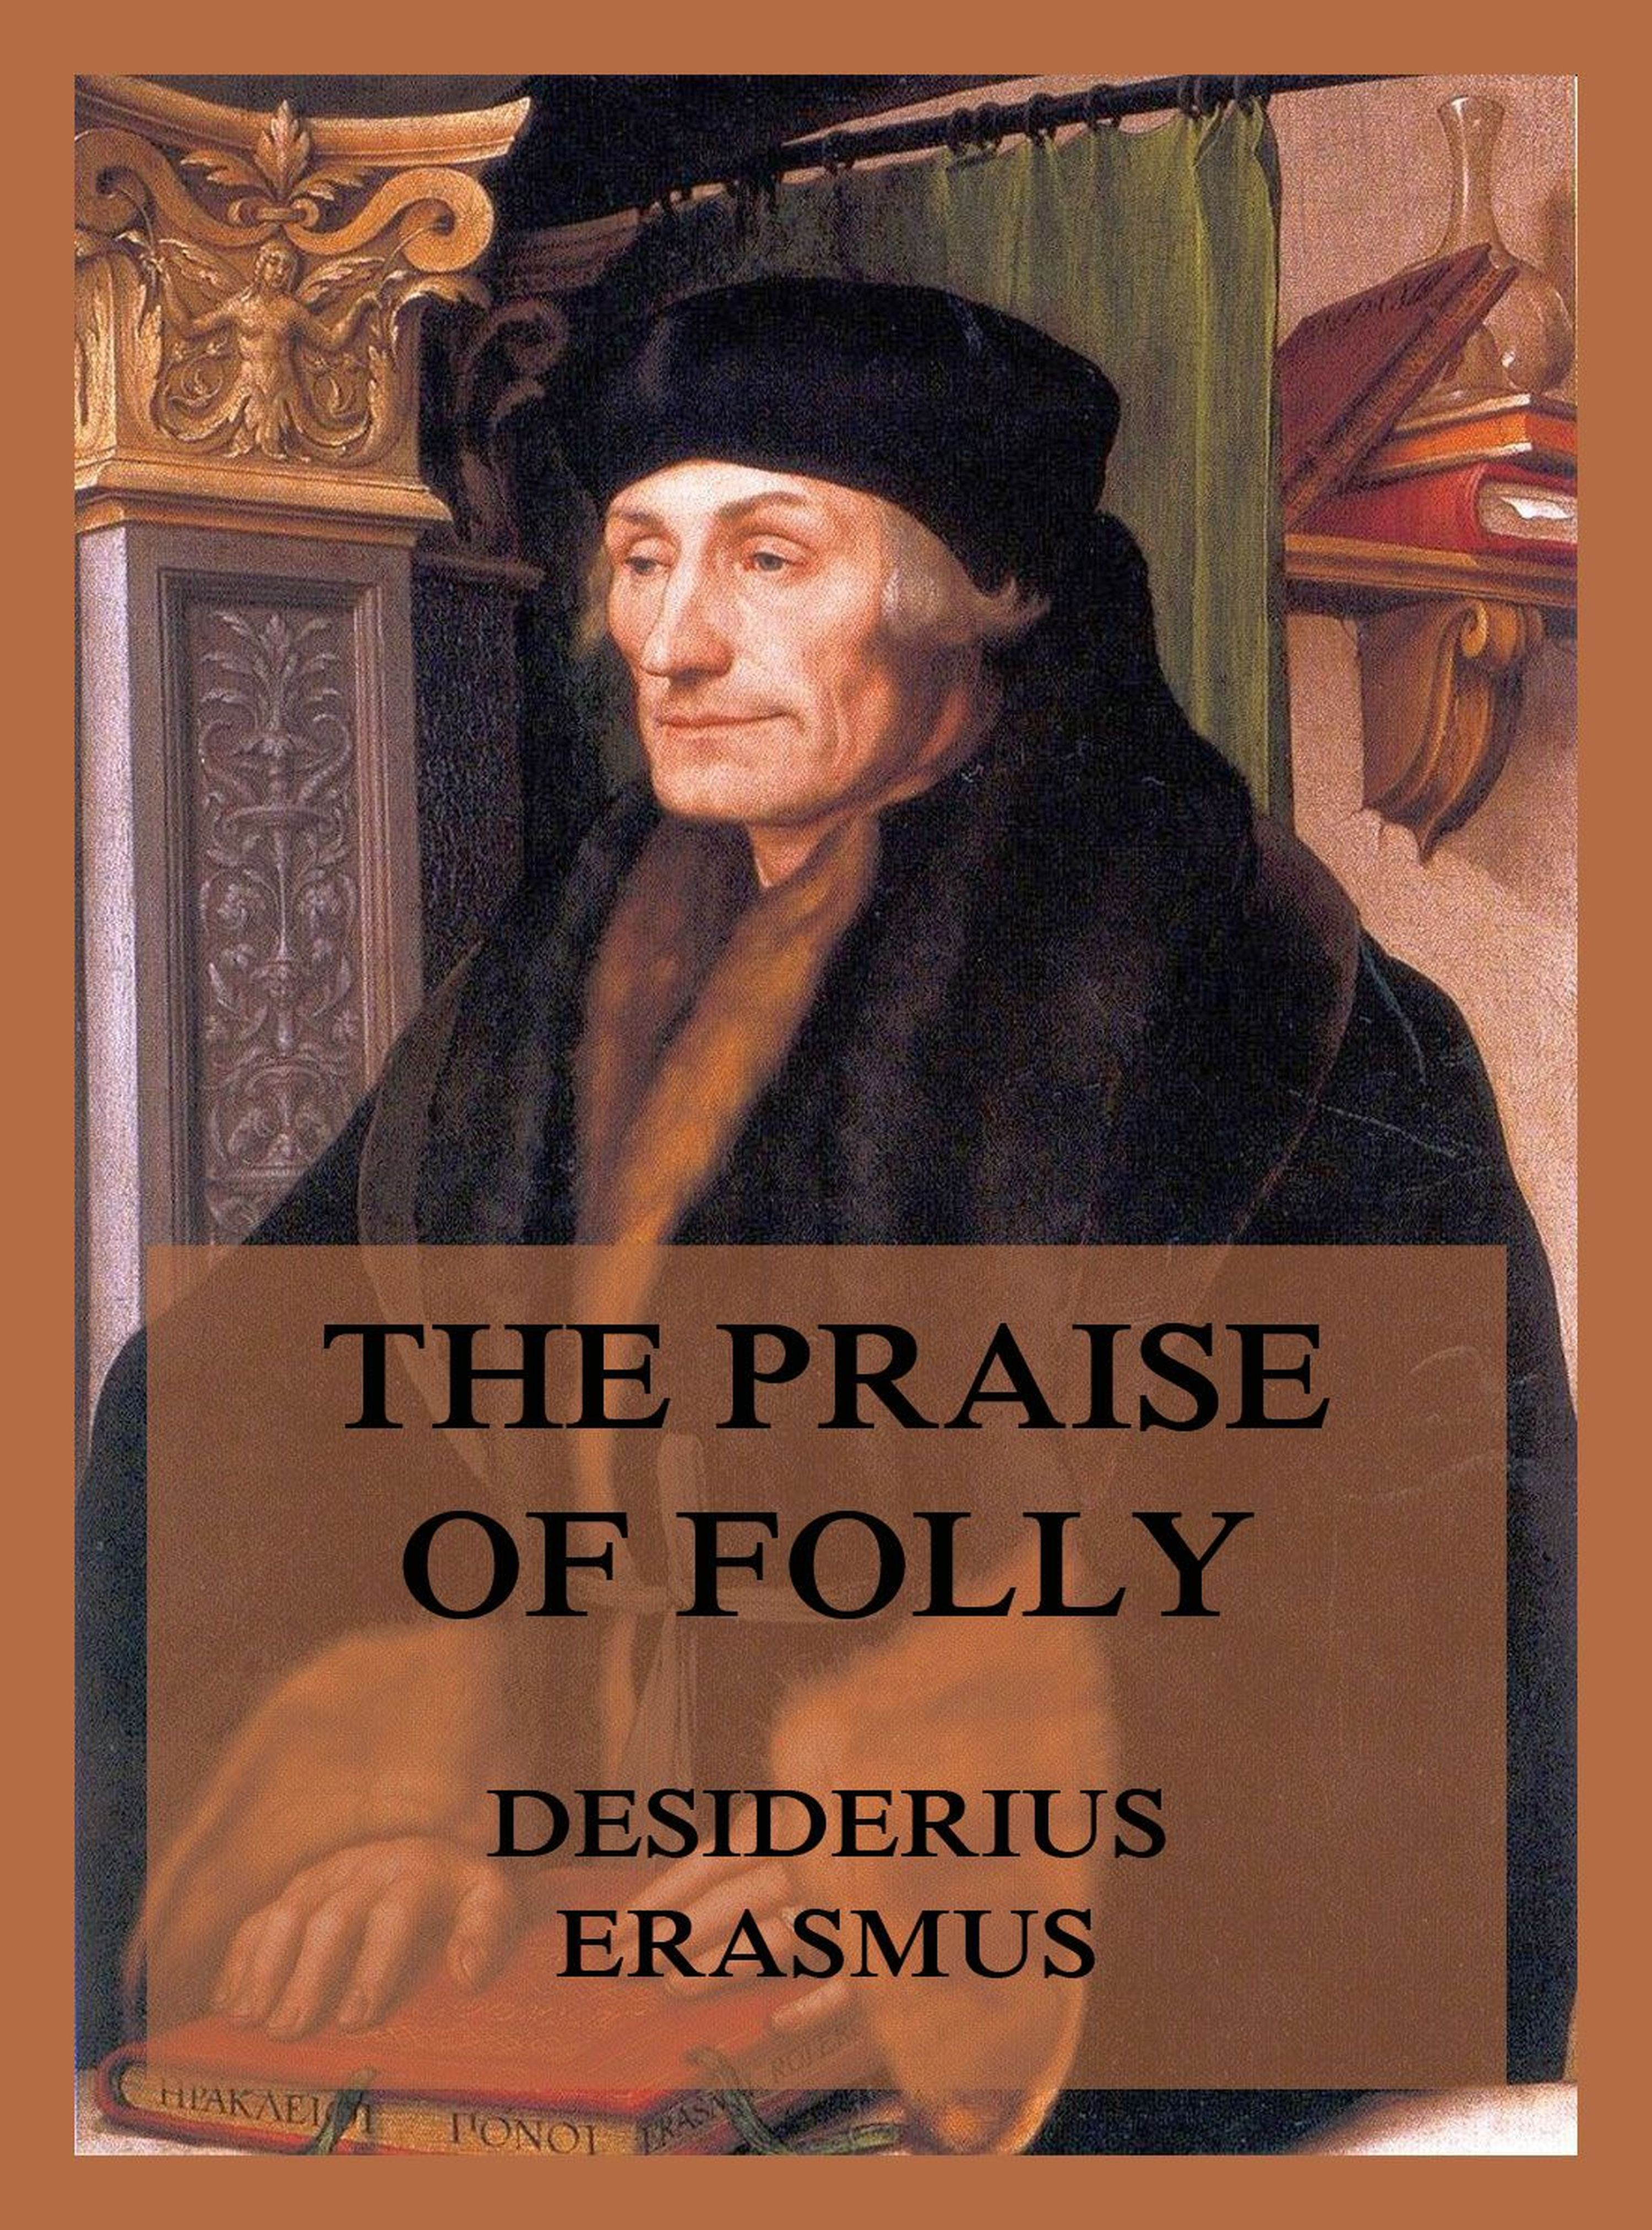 Desiderius Erasmus The Praise of Folly